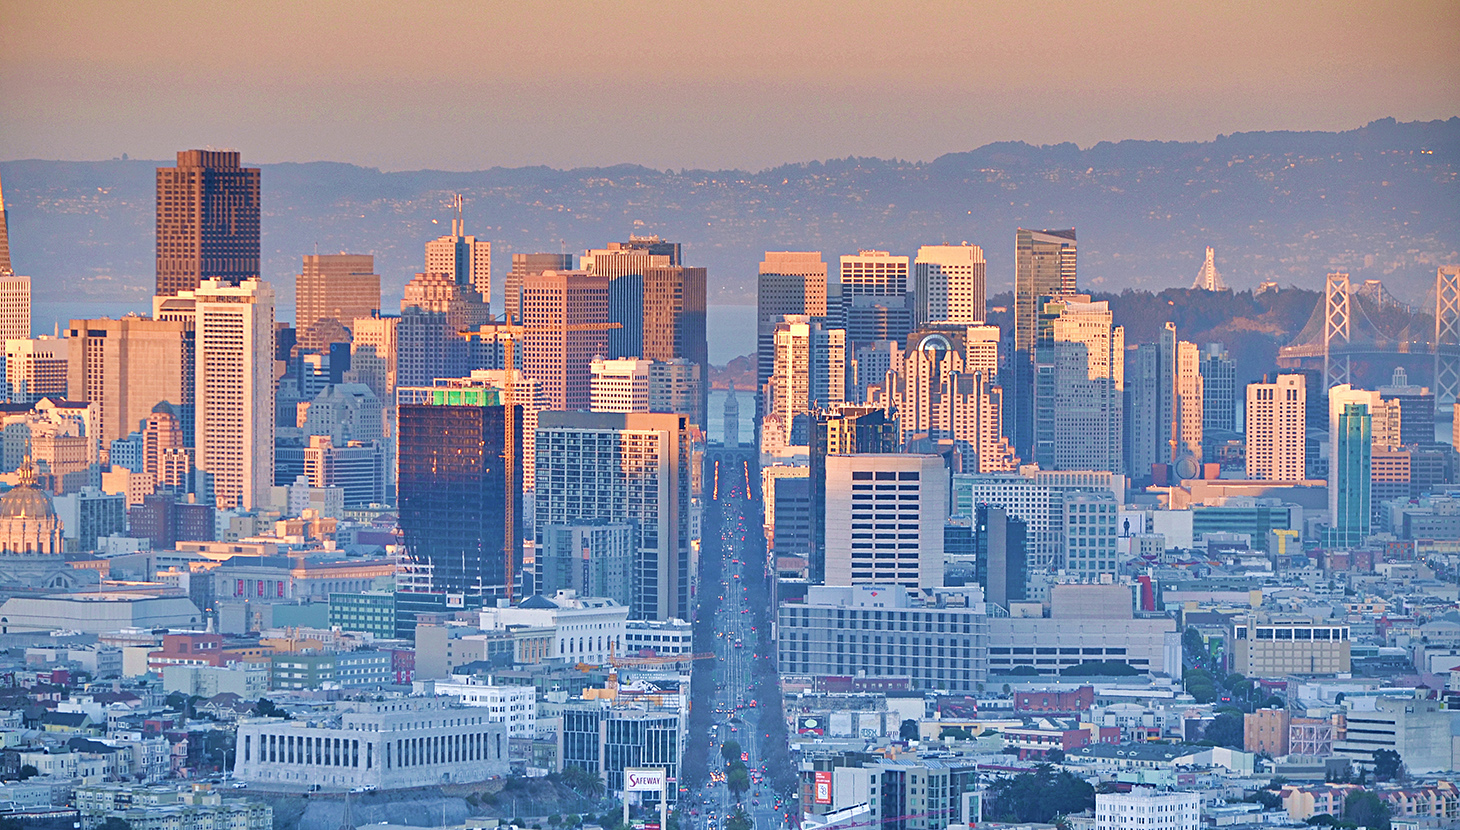 San Francisco. ph. Daniel Perks (Flickr)